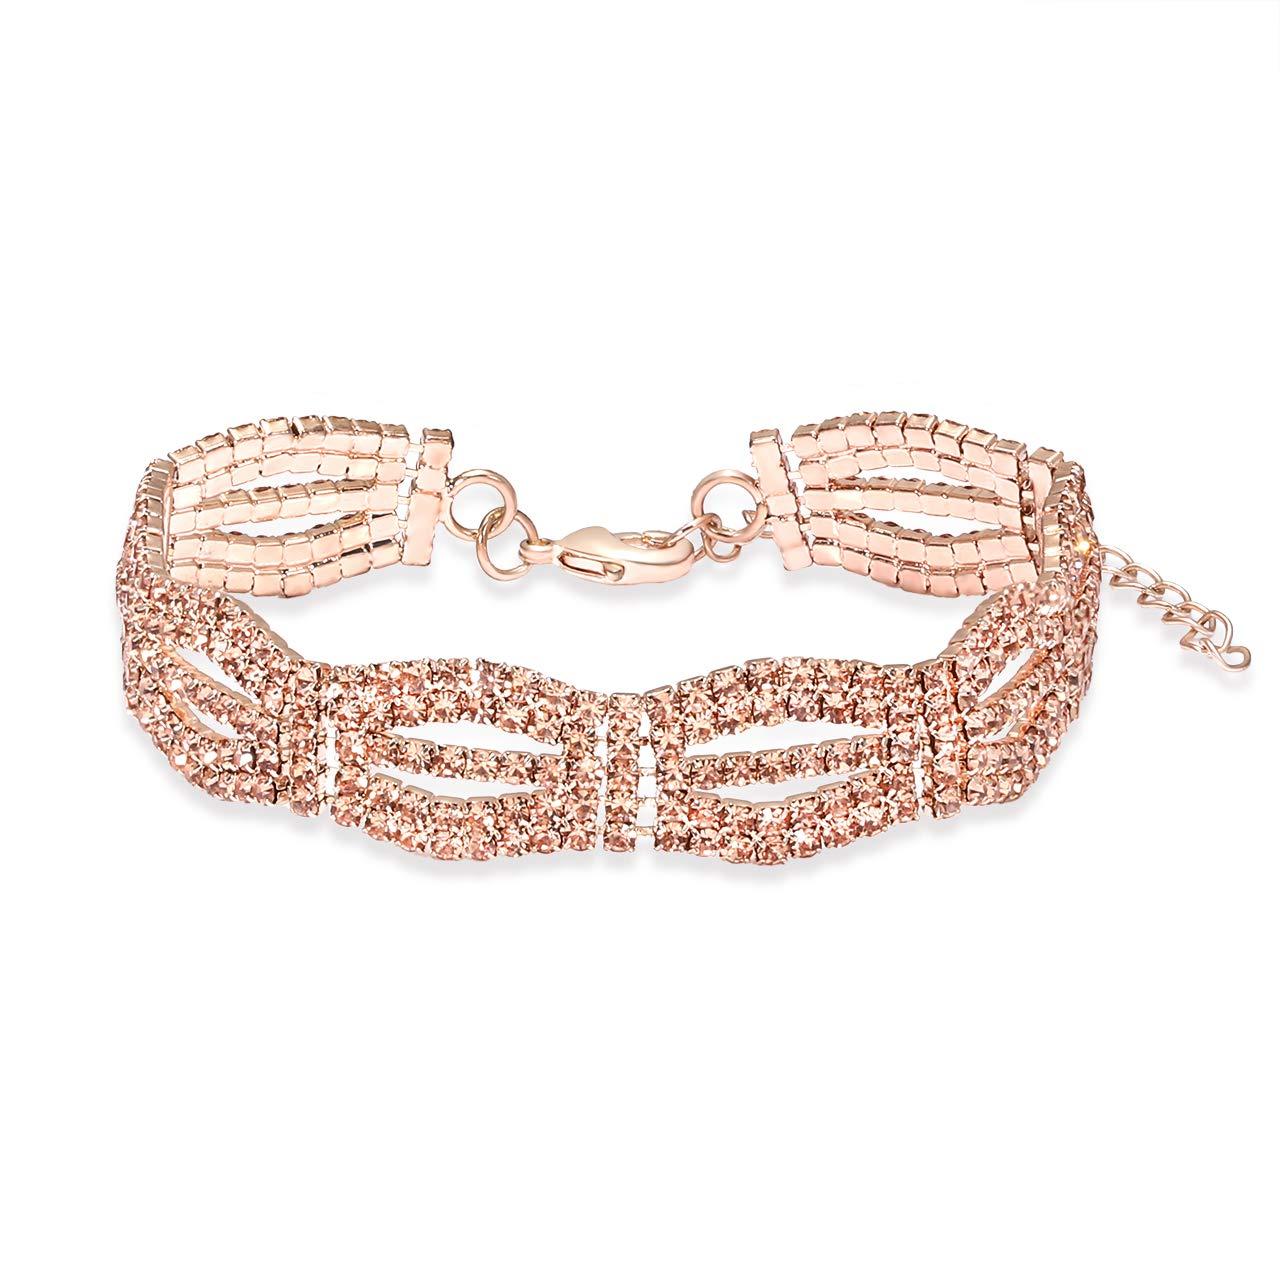 YEYA Adjustable Cubic Zirconia Classic Tennis Bracelet for Women Chain Link Bangle Bracelet Jewelry (Rose Gold) by YEYA